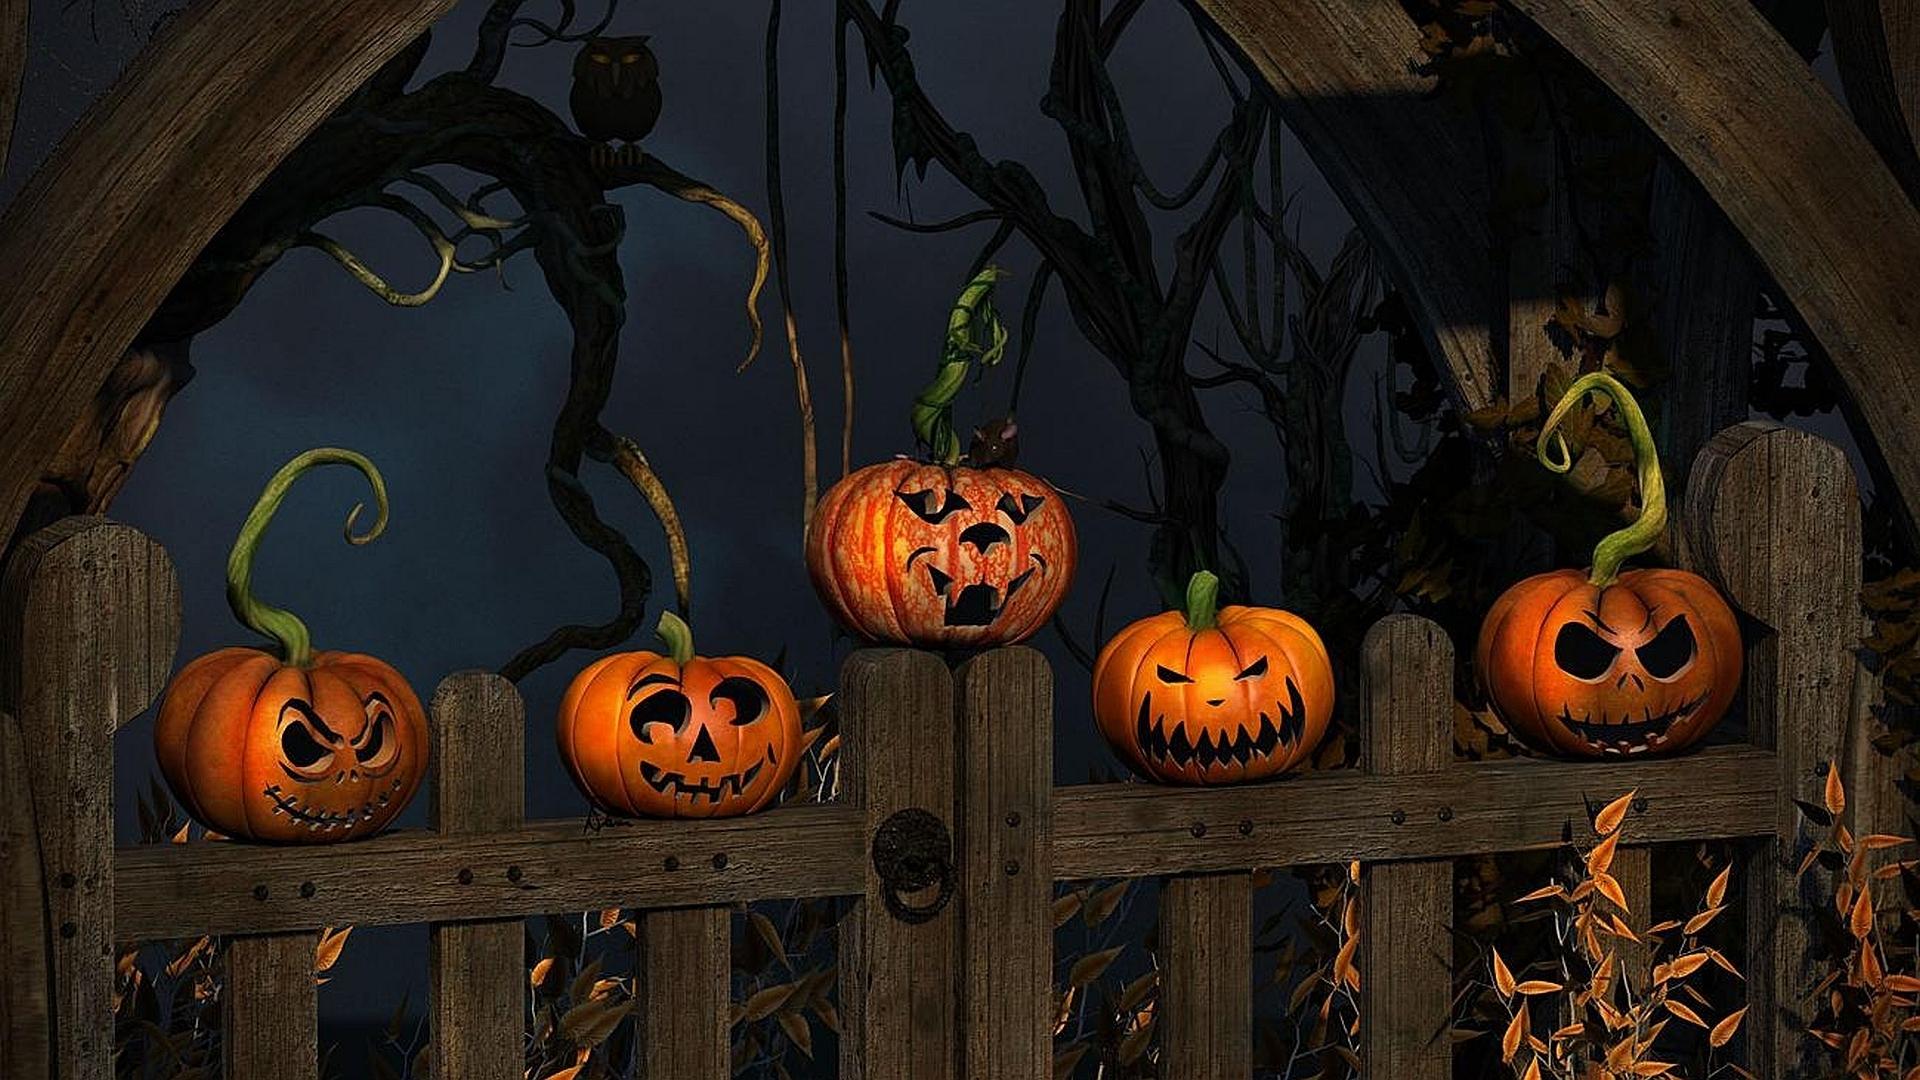 halloween full hd fond d'écran and arrière-plan   1920x1080   id:173865